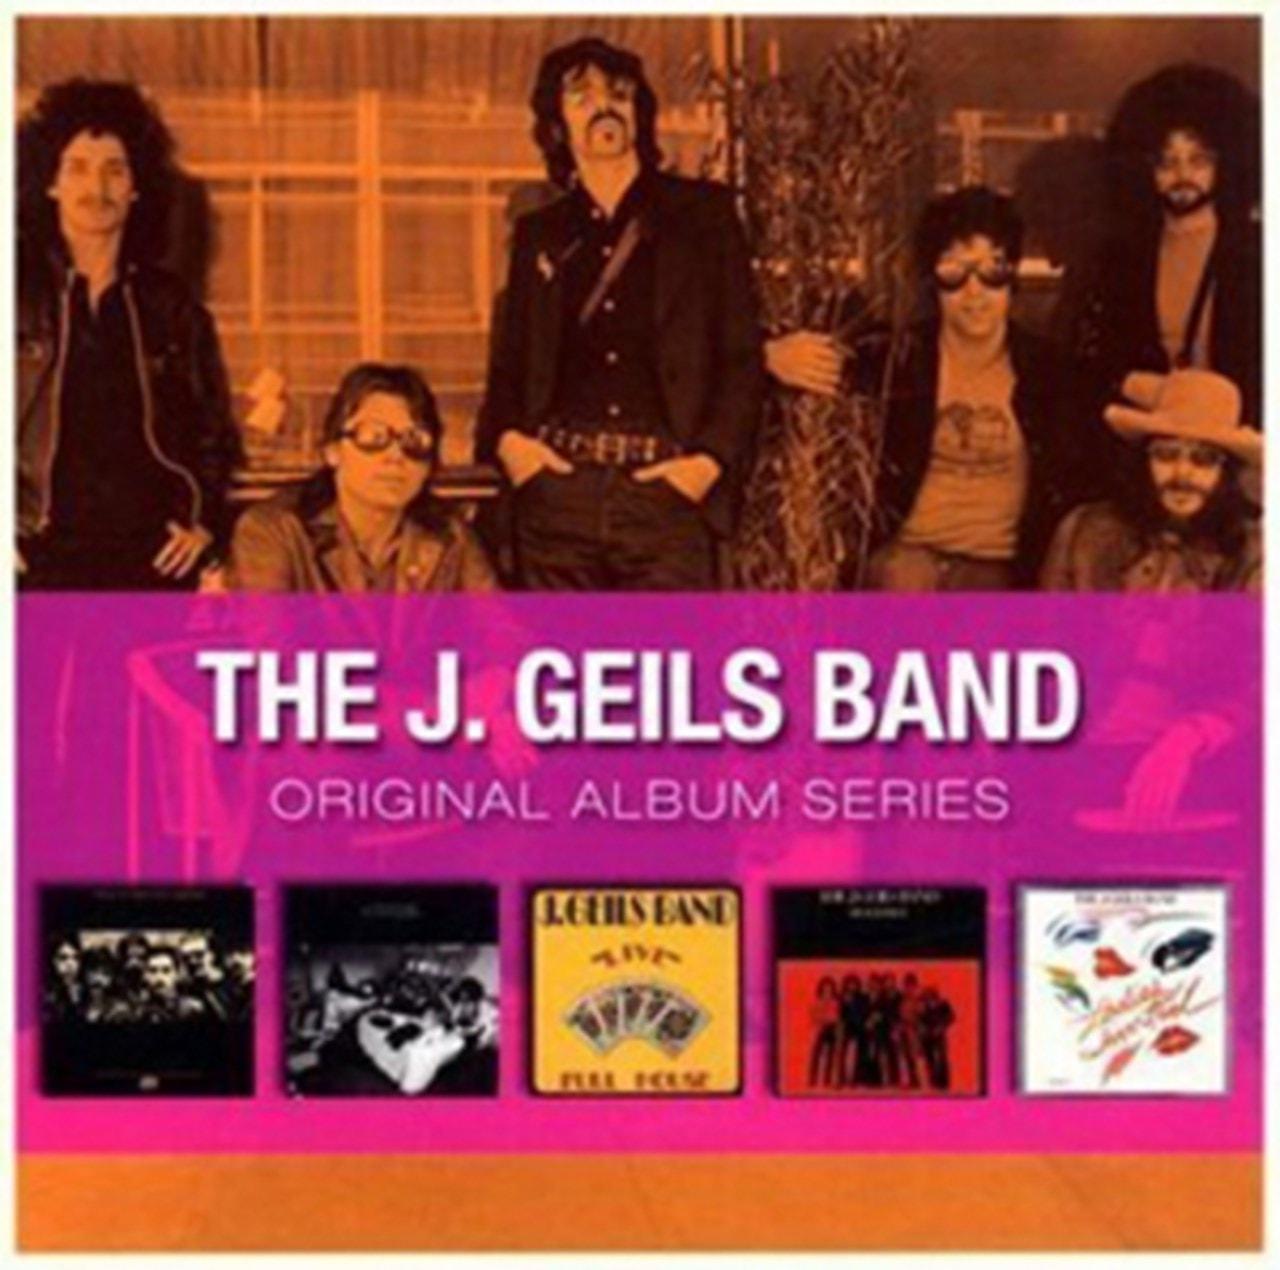 J. Geils Band - 1